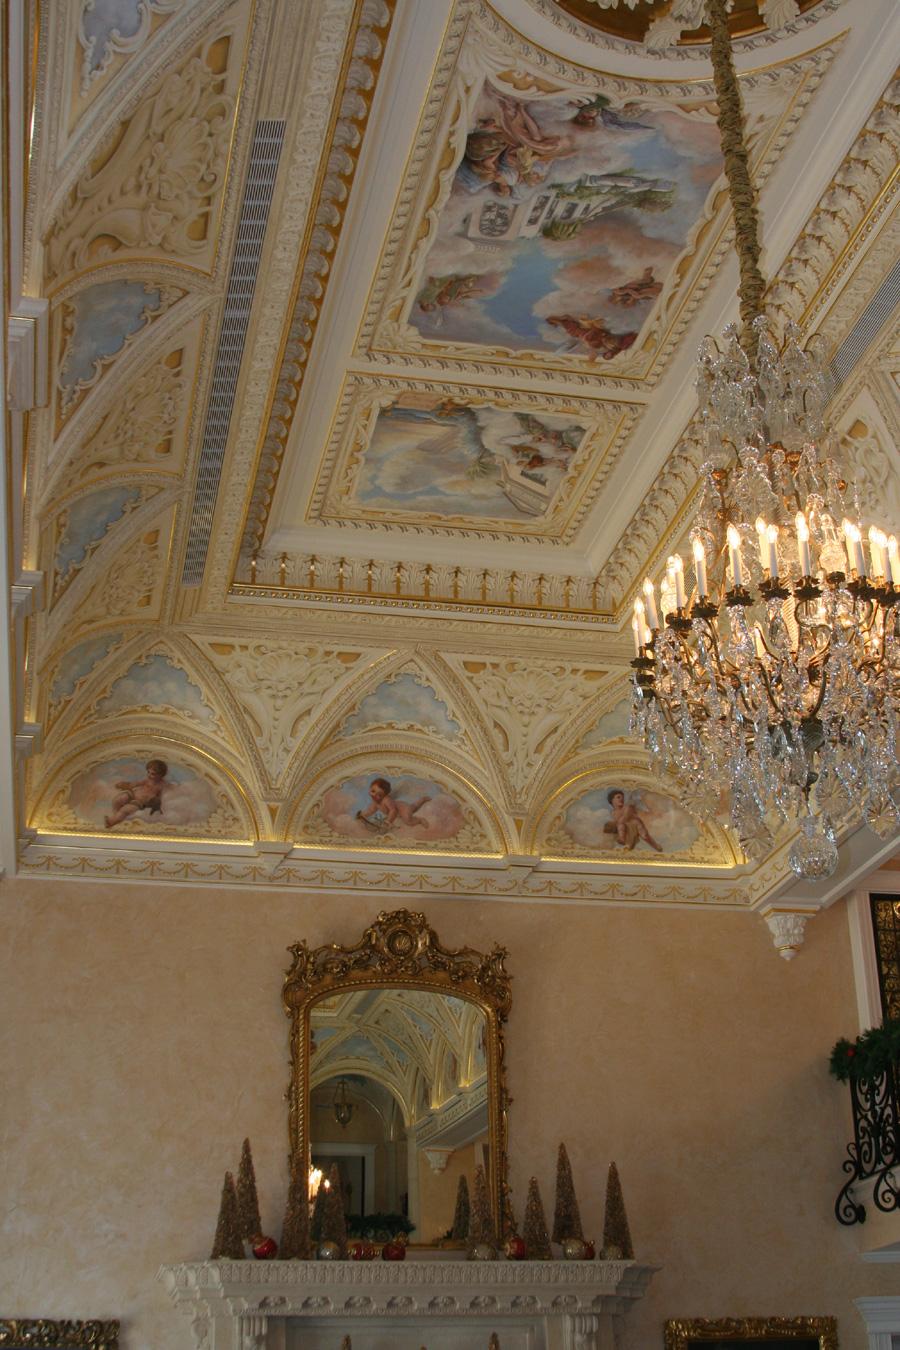 ornate ceiling mural